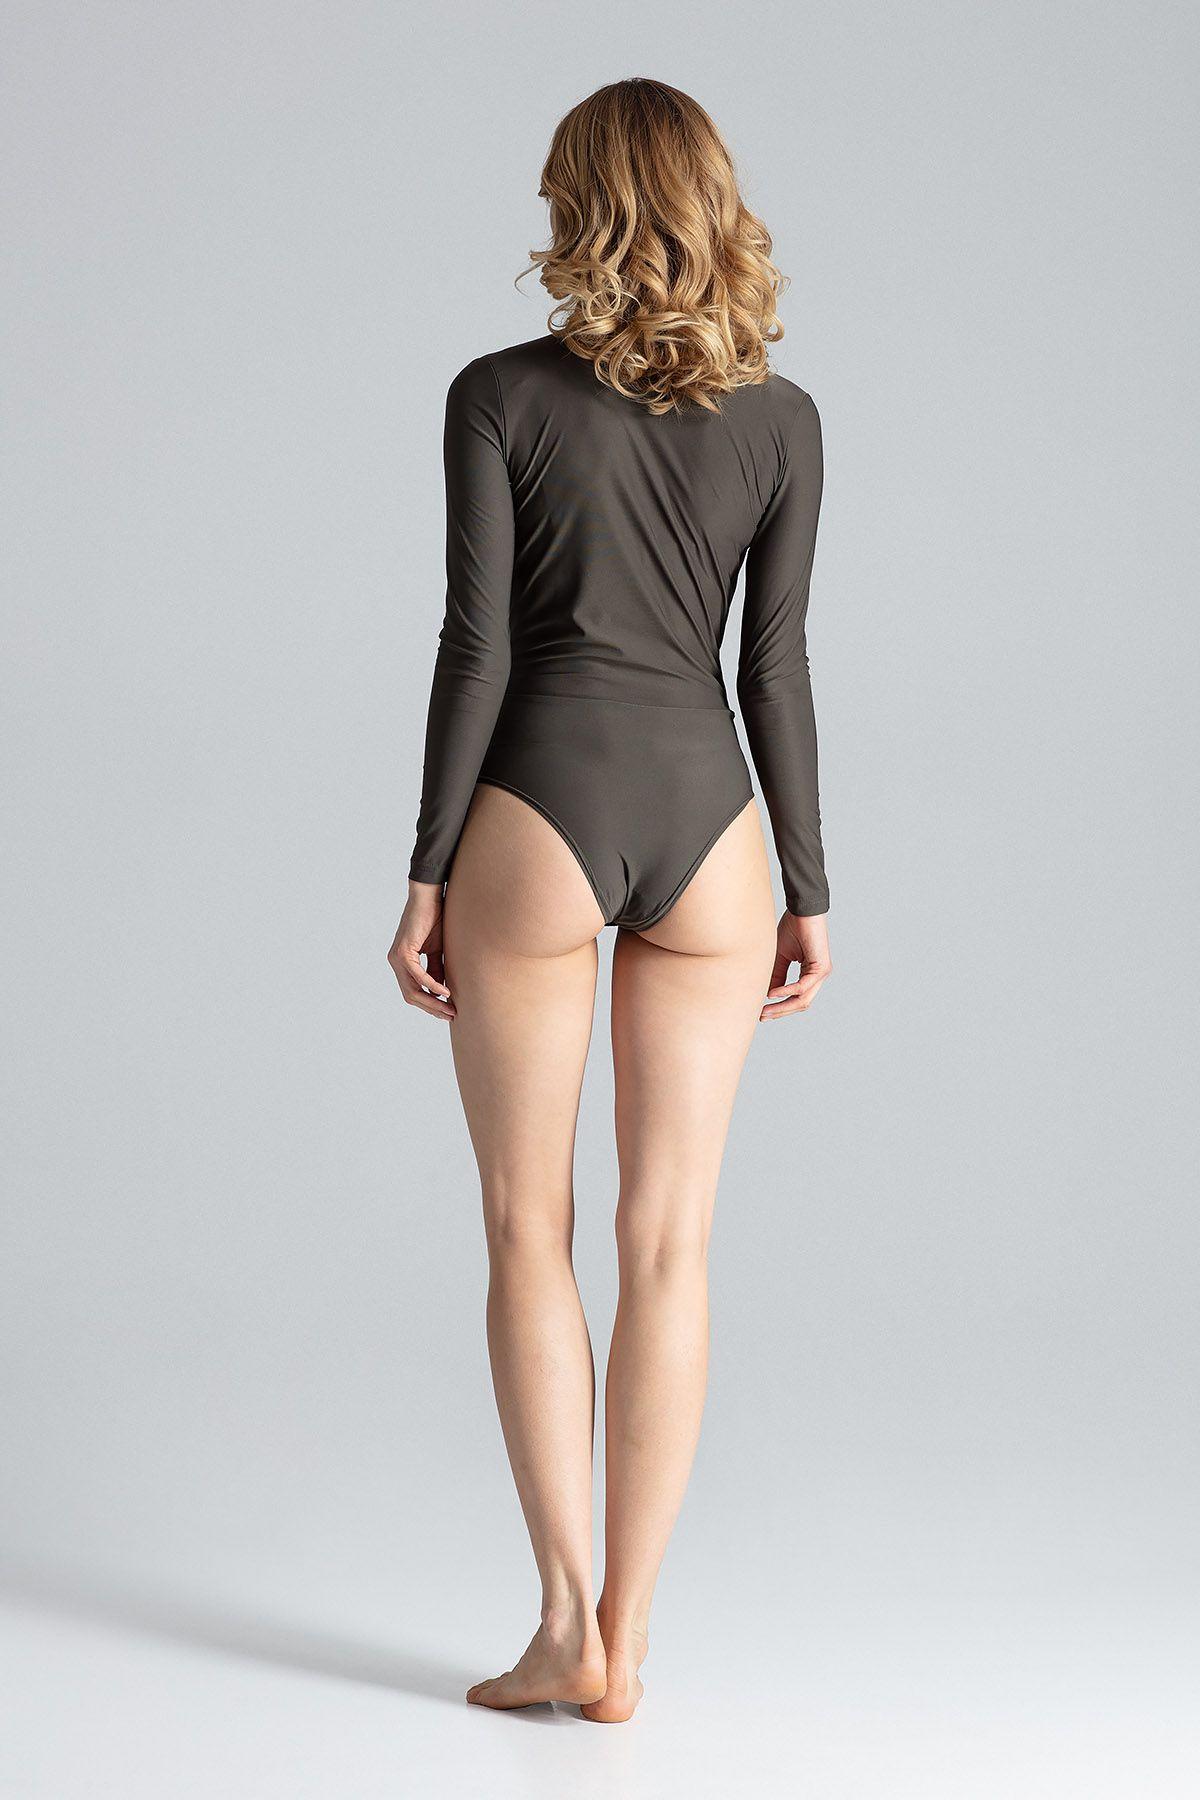 Olive Elegant Long-Sleeved Body